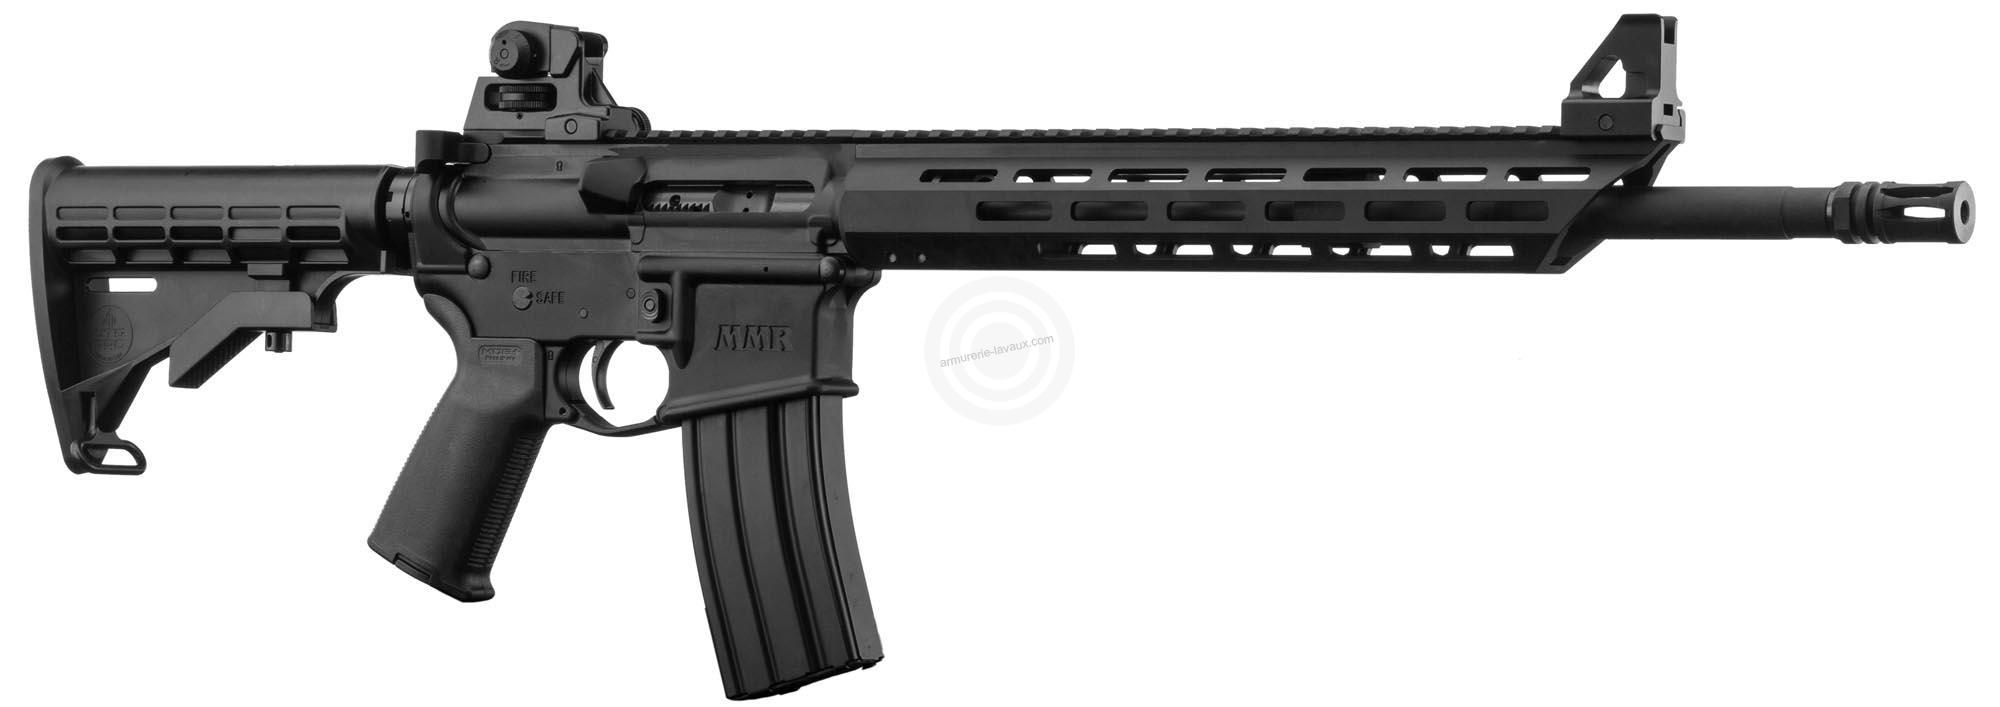 Carabine MOSSBERG AR15 MMR TACTICAL Gén.2 cal.223 Rem